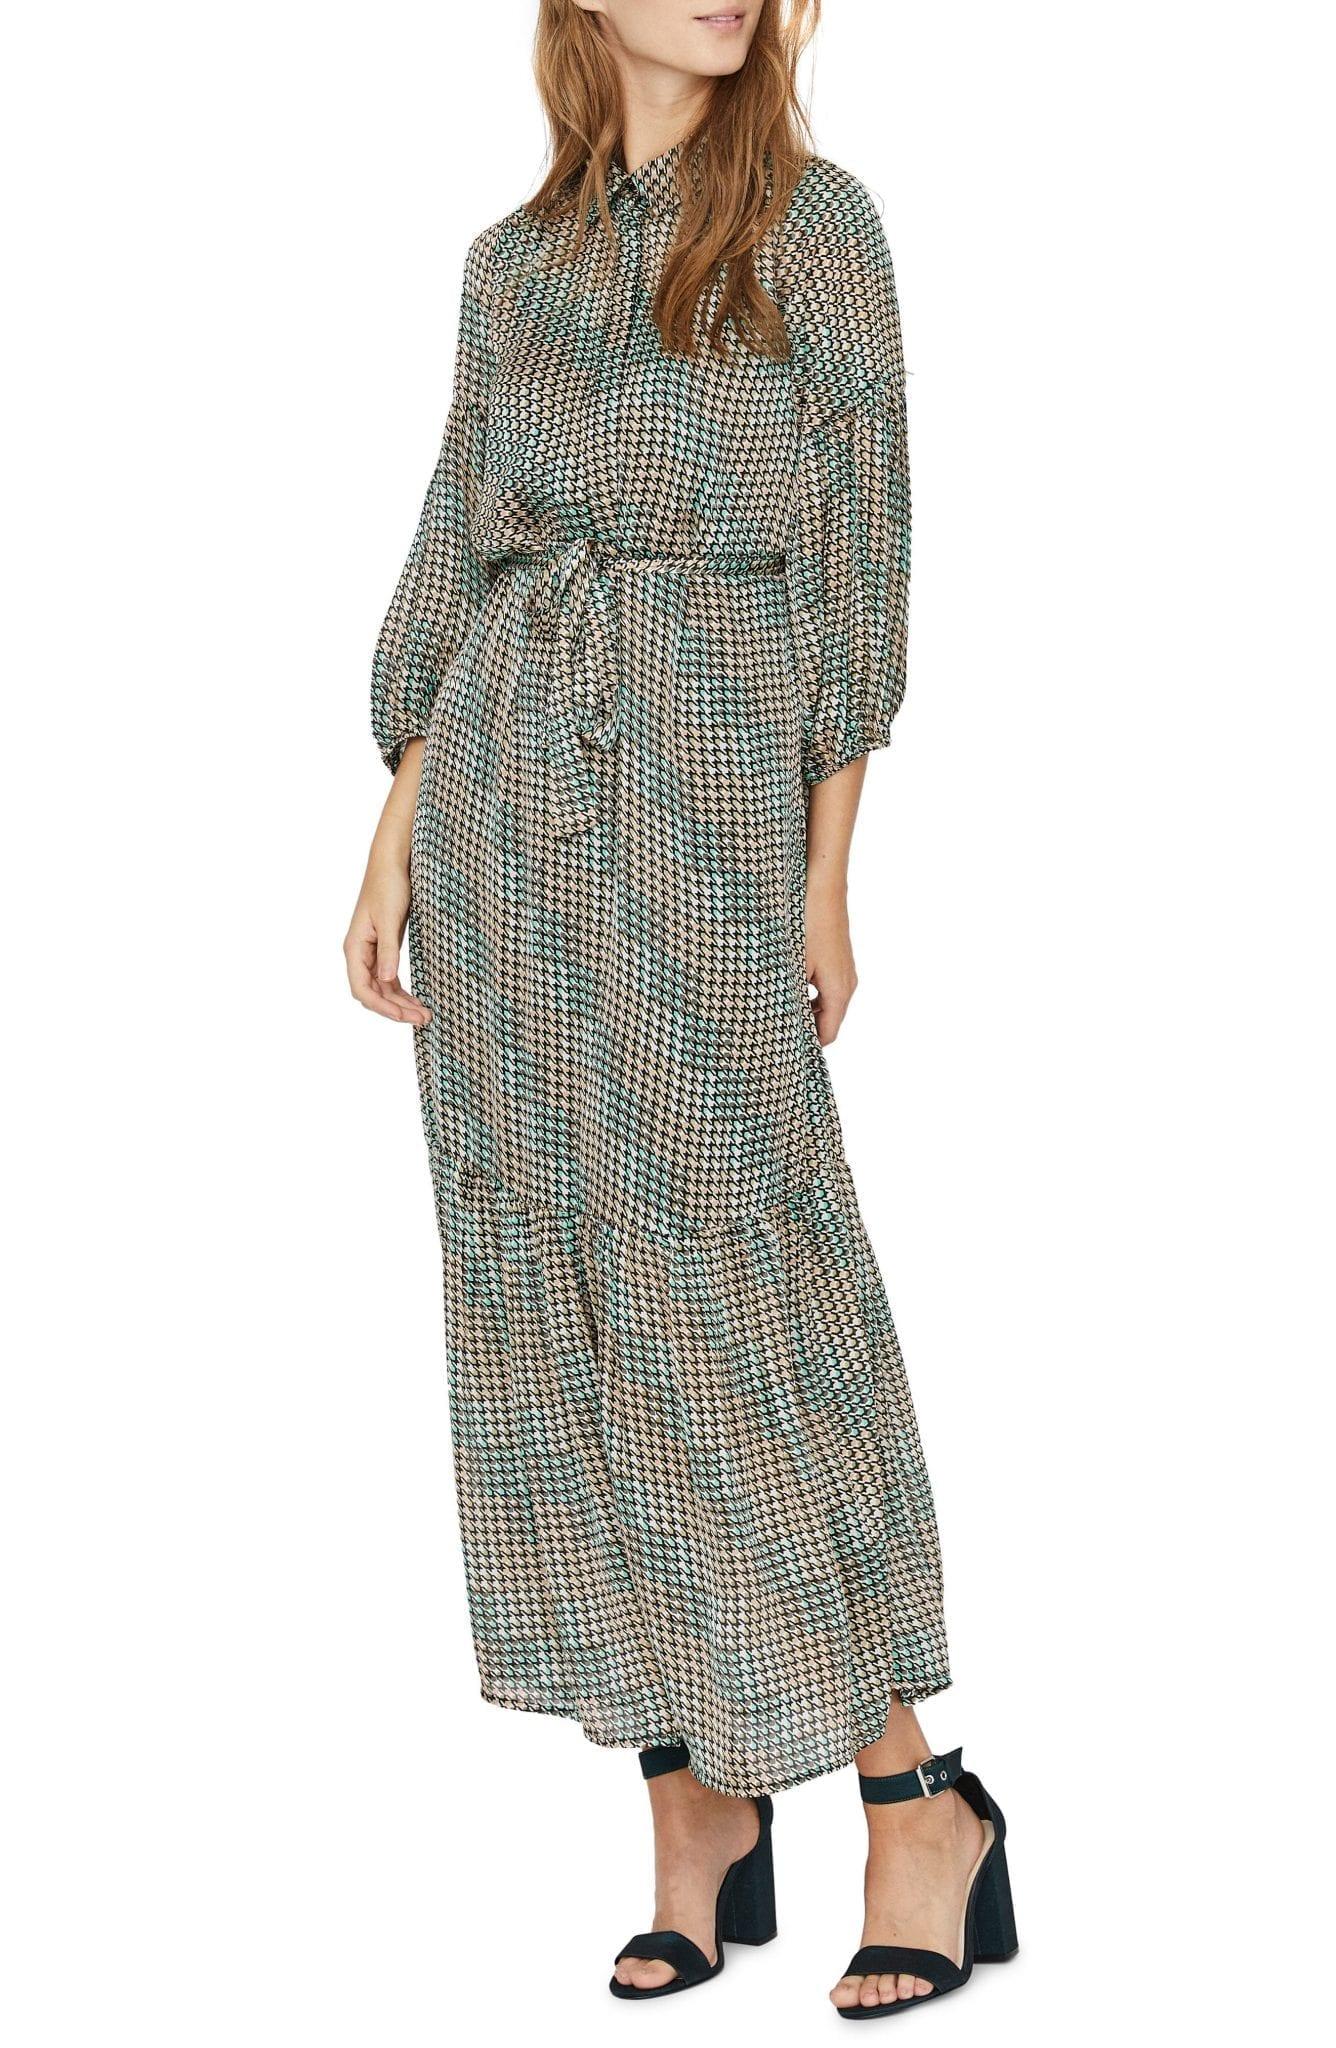 VERO MODA Berta Print Three Quarter Sleeve Shirt Dress